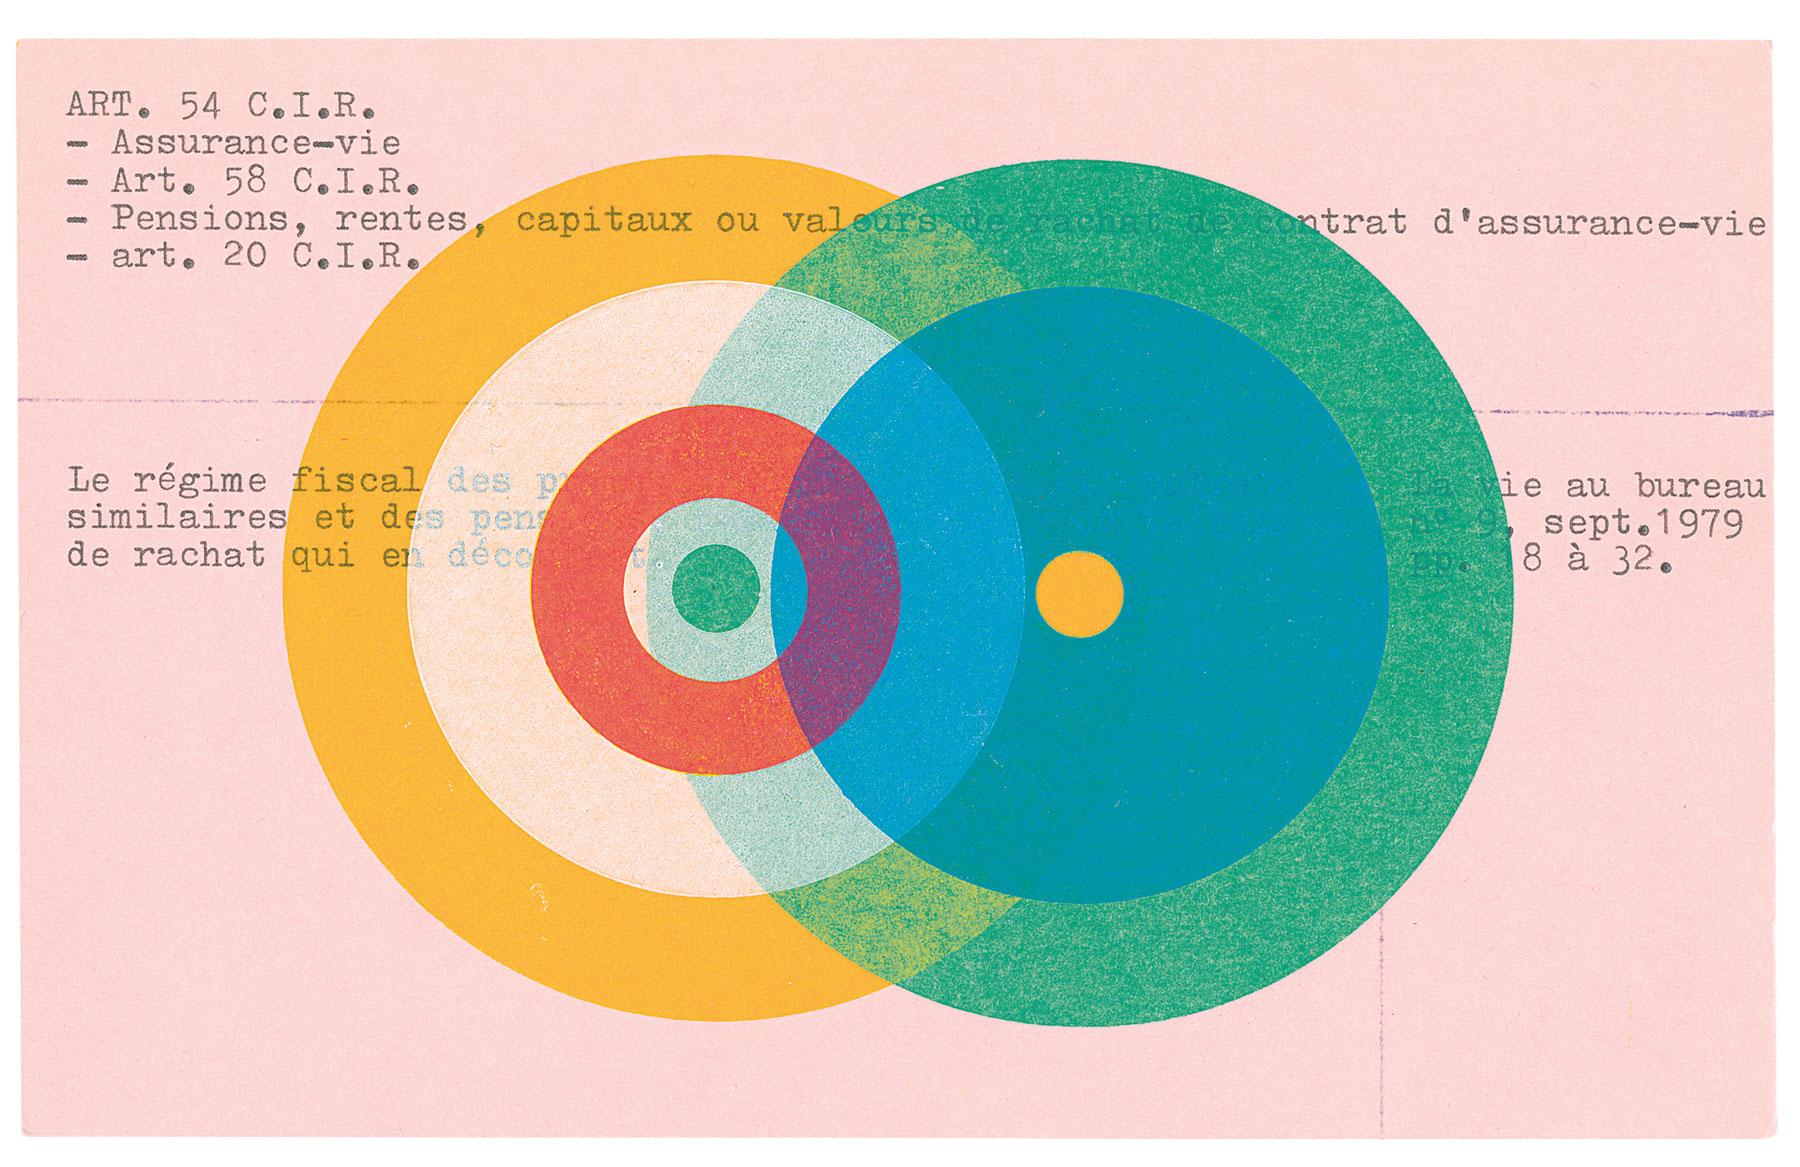 Karel-Martens_pr014-web